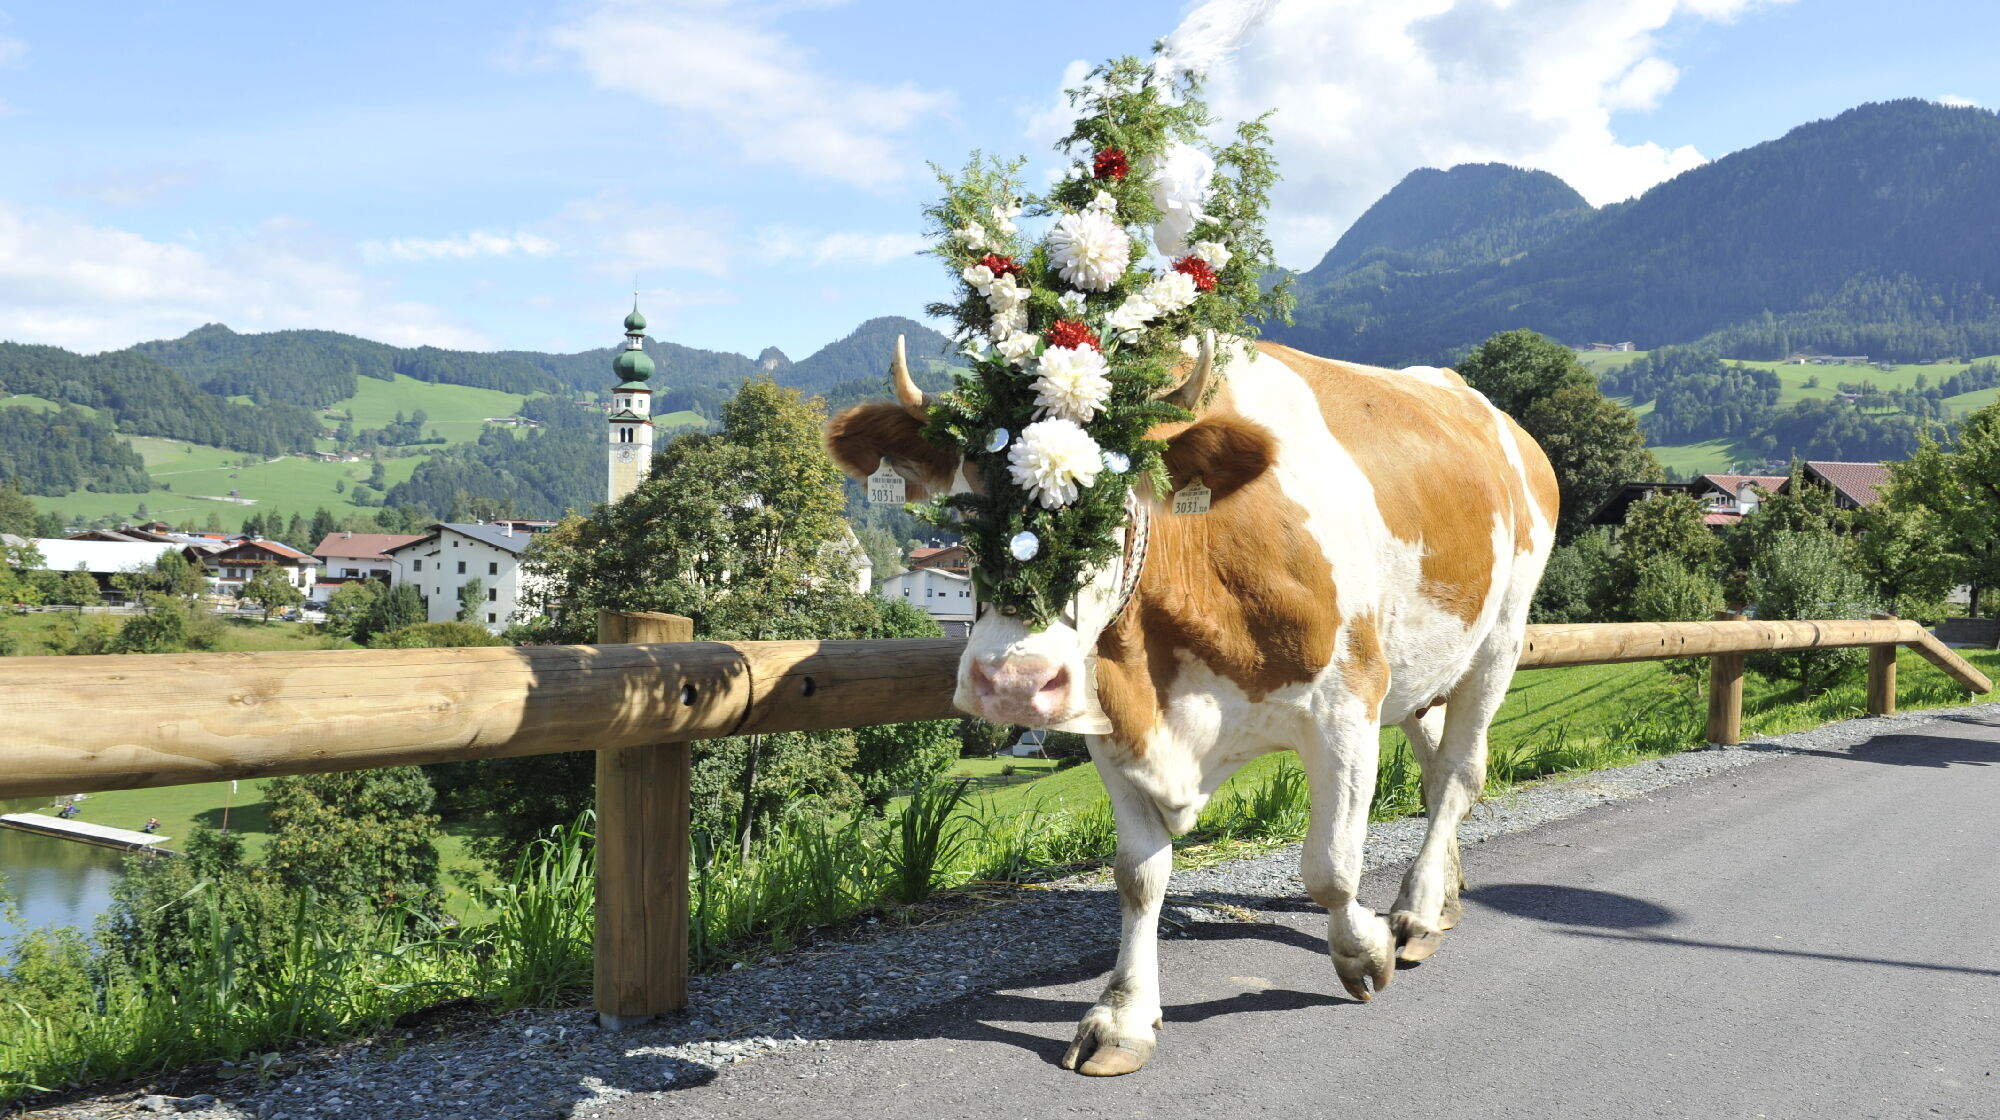 Festlich geschmückte Kuh